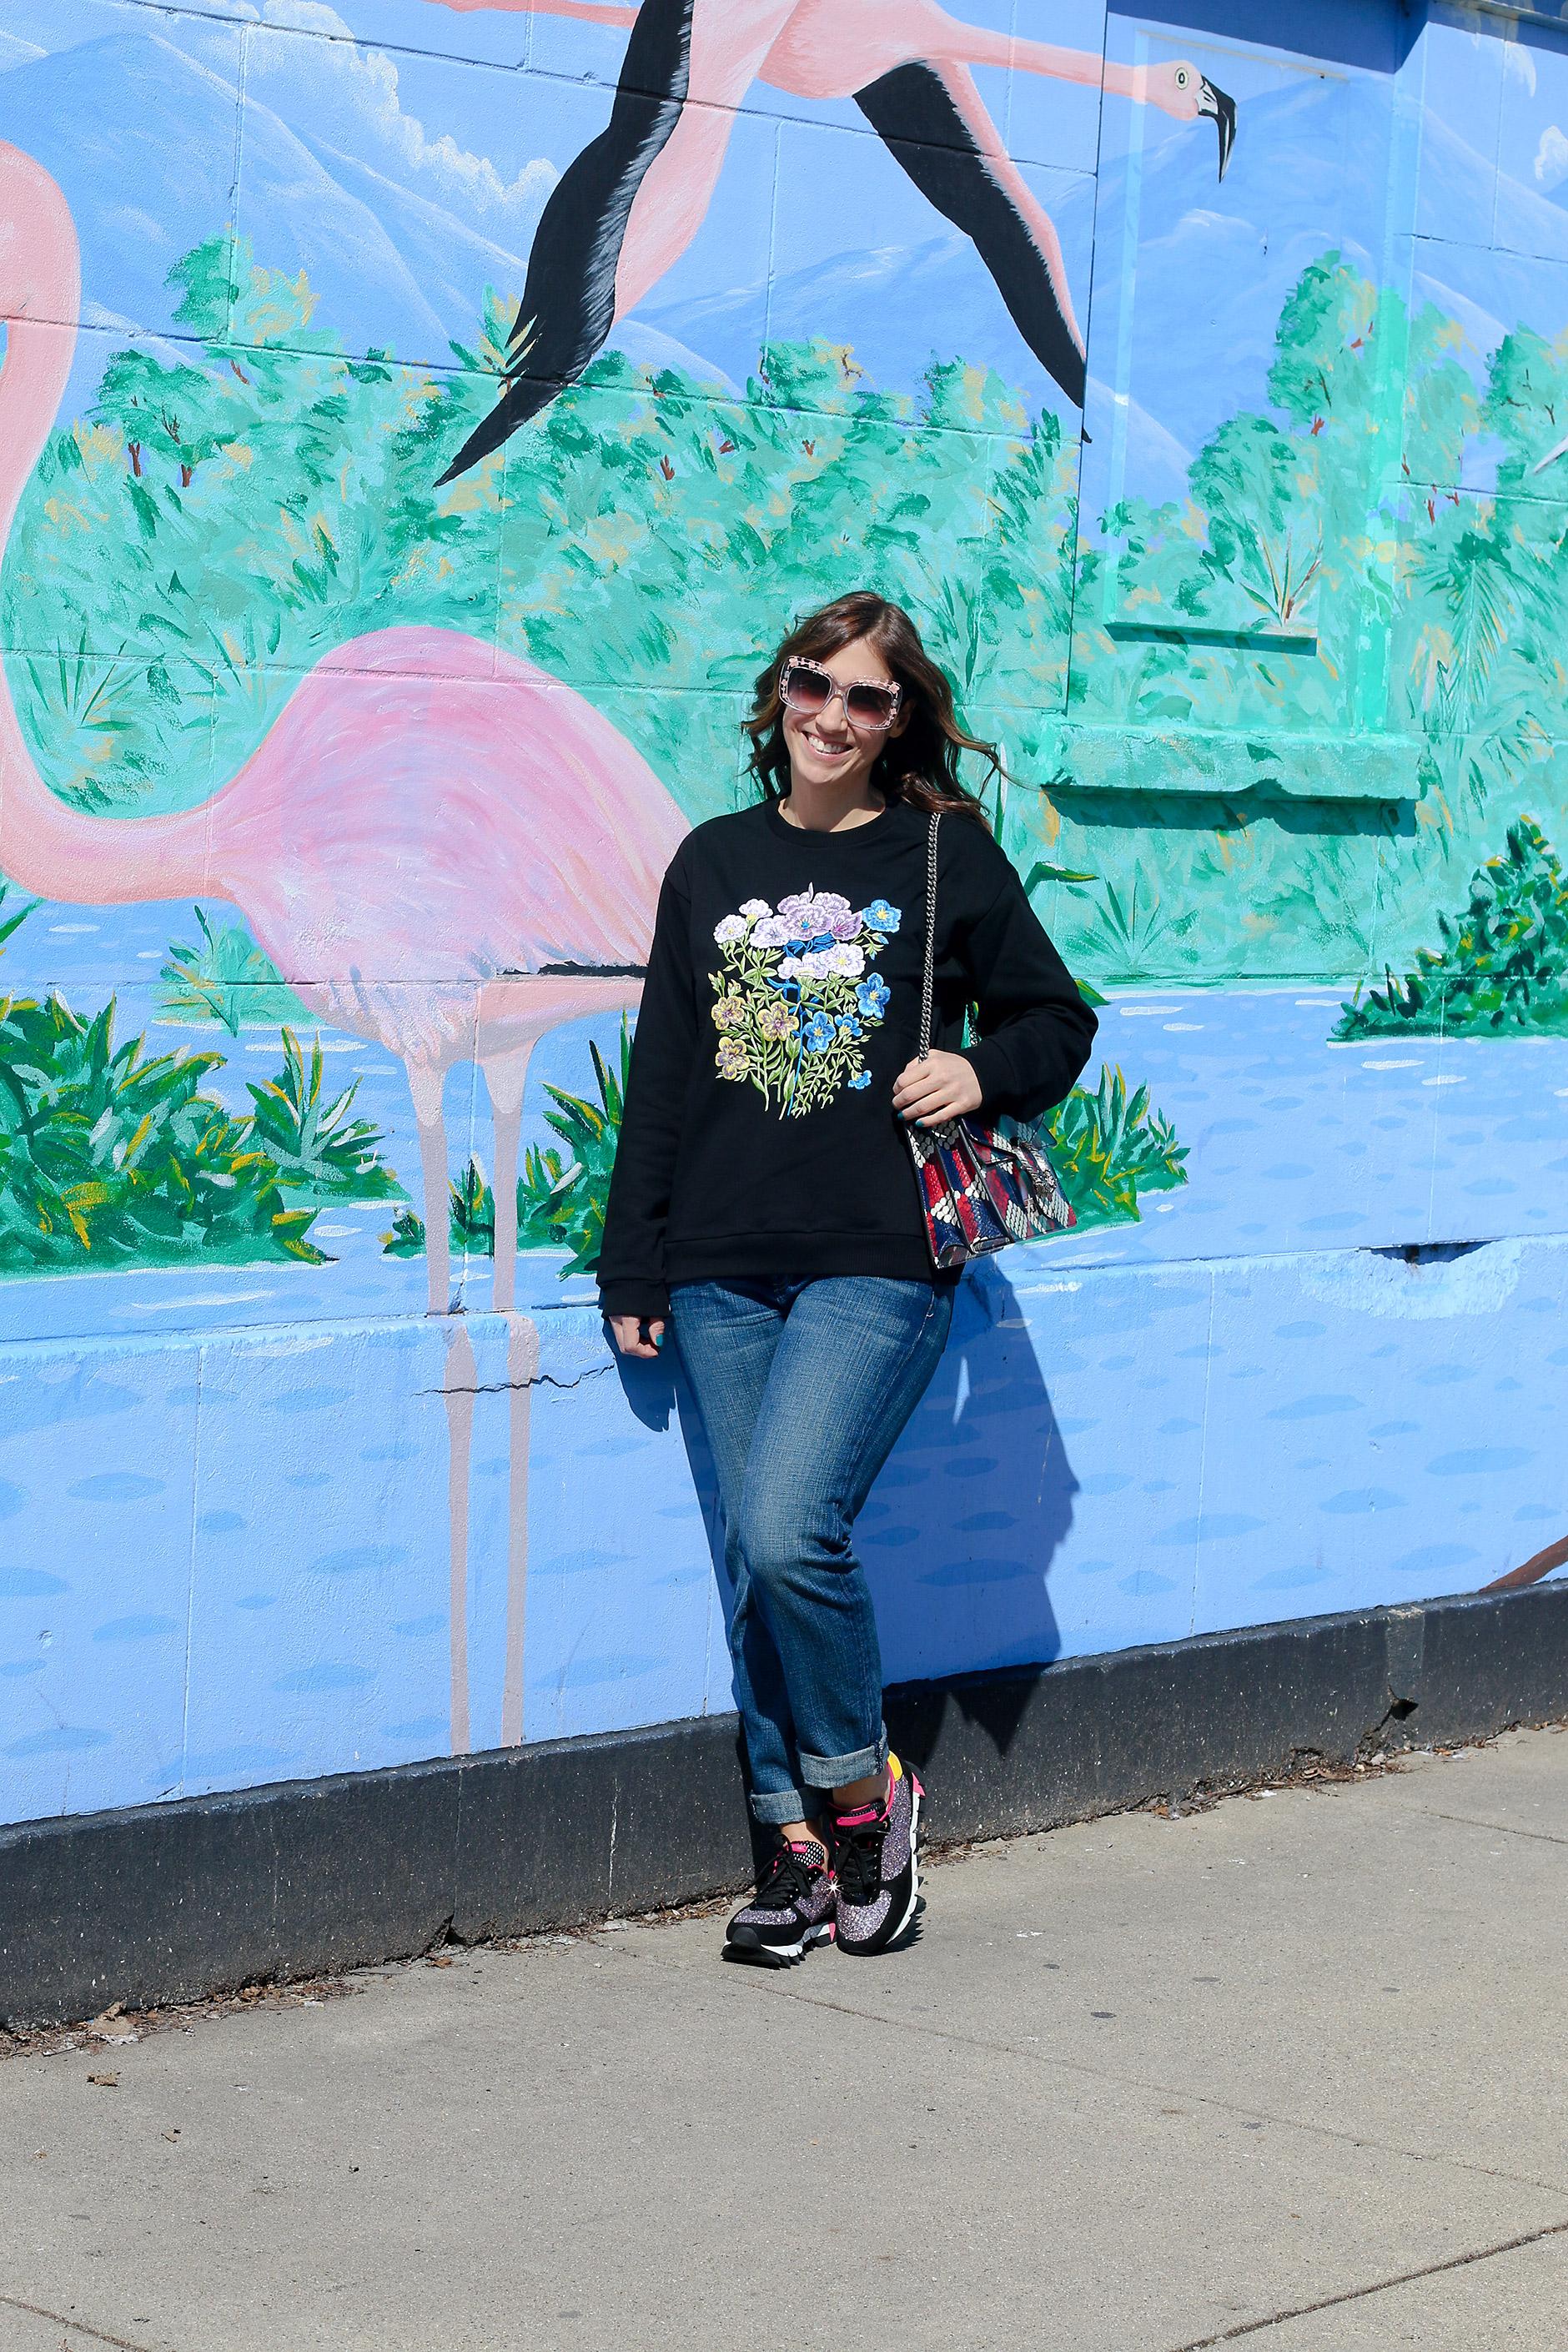 Anna Roufos Sosa of Noir Friday wearing a Christopher Kane sweatshirt and Dolce & Gabbana sneakers.